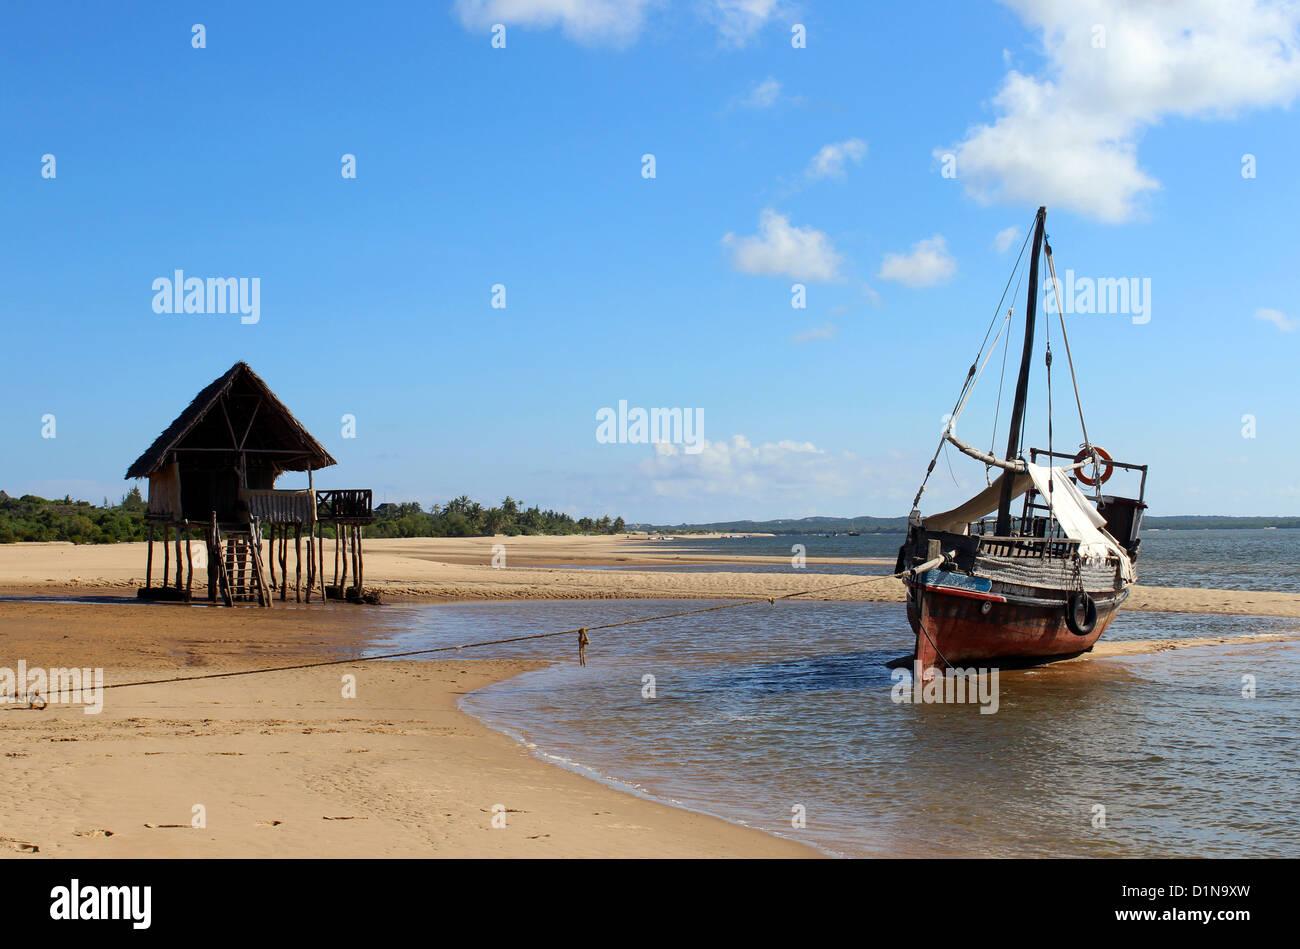 Strand und Ufer vorne an der Kipungani Explorer Beach Resort, Insel Lamu, Kenia, Ostafrika Stockbild